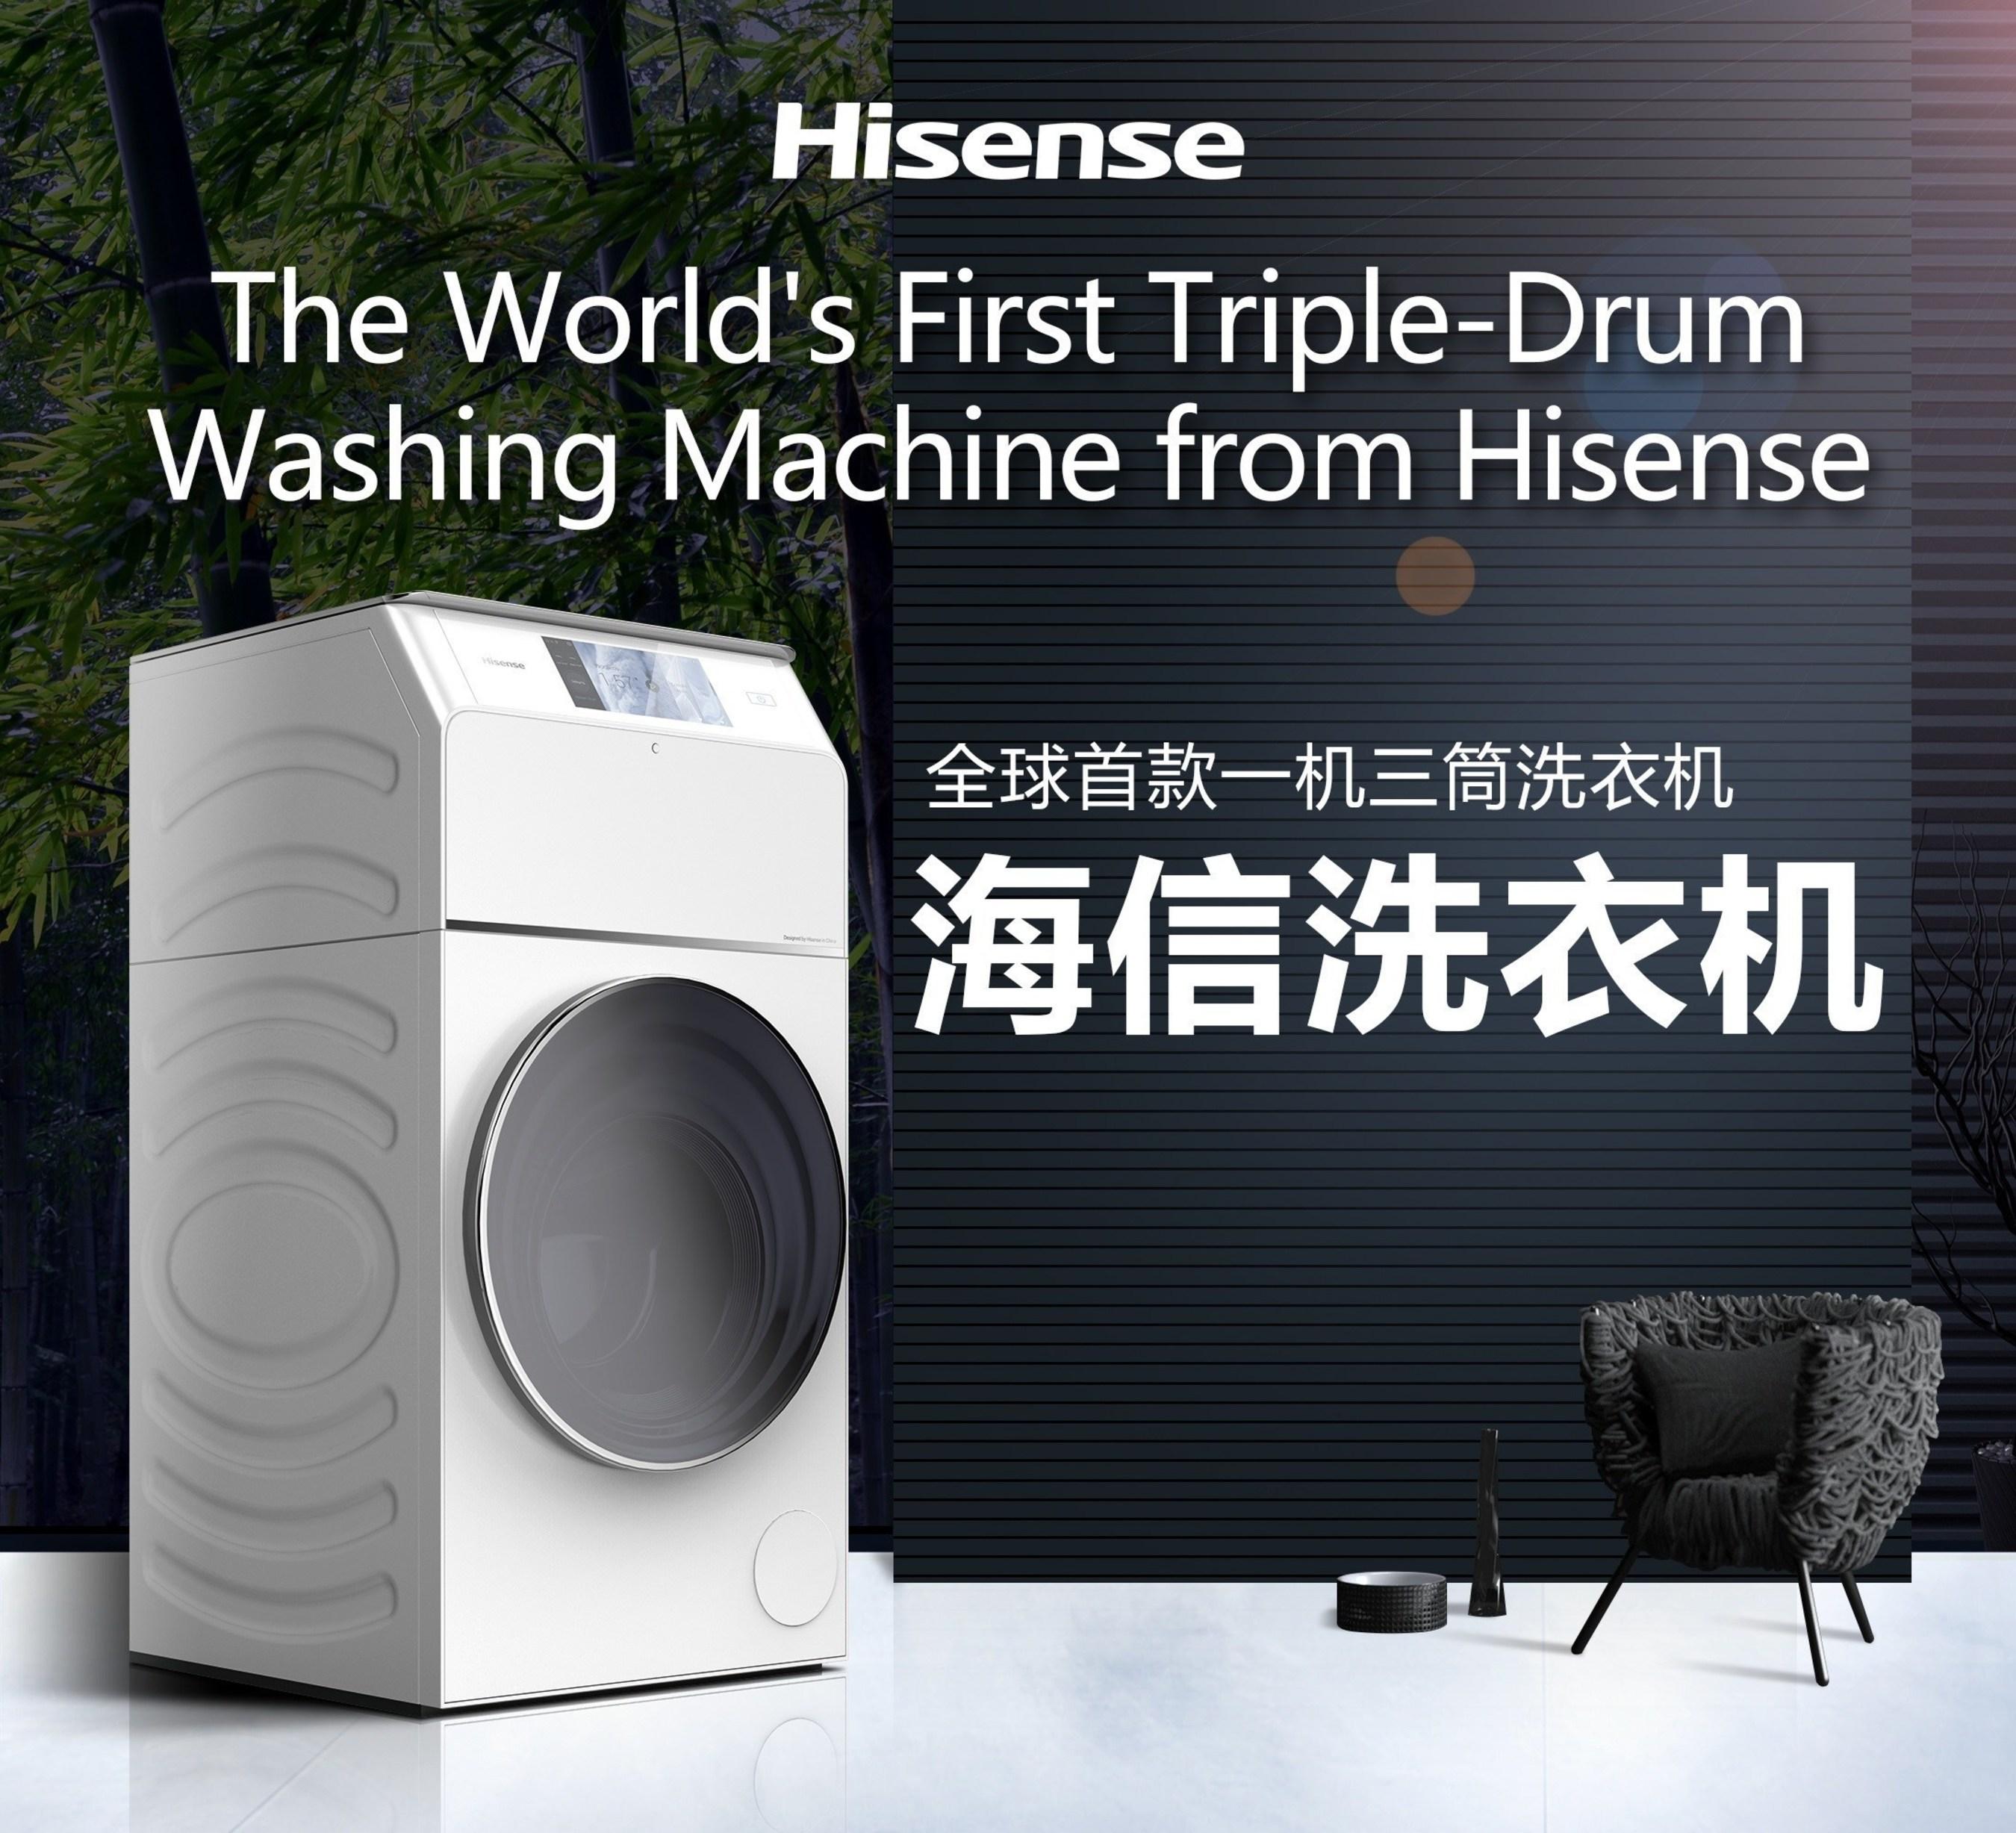 Hisense Showcases World's First Triple-Drum Washing Machine at IFA 2016